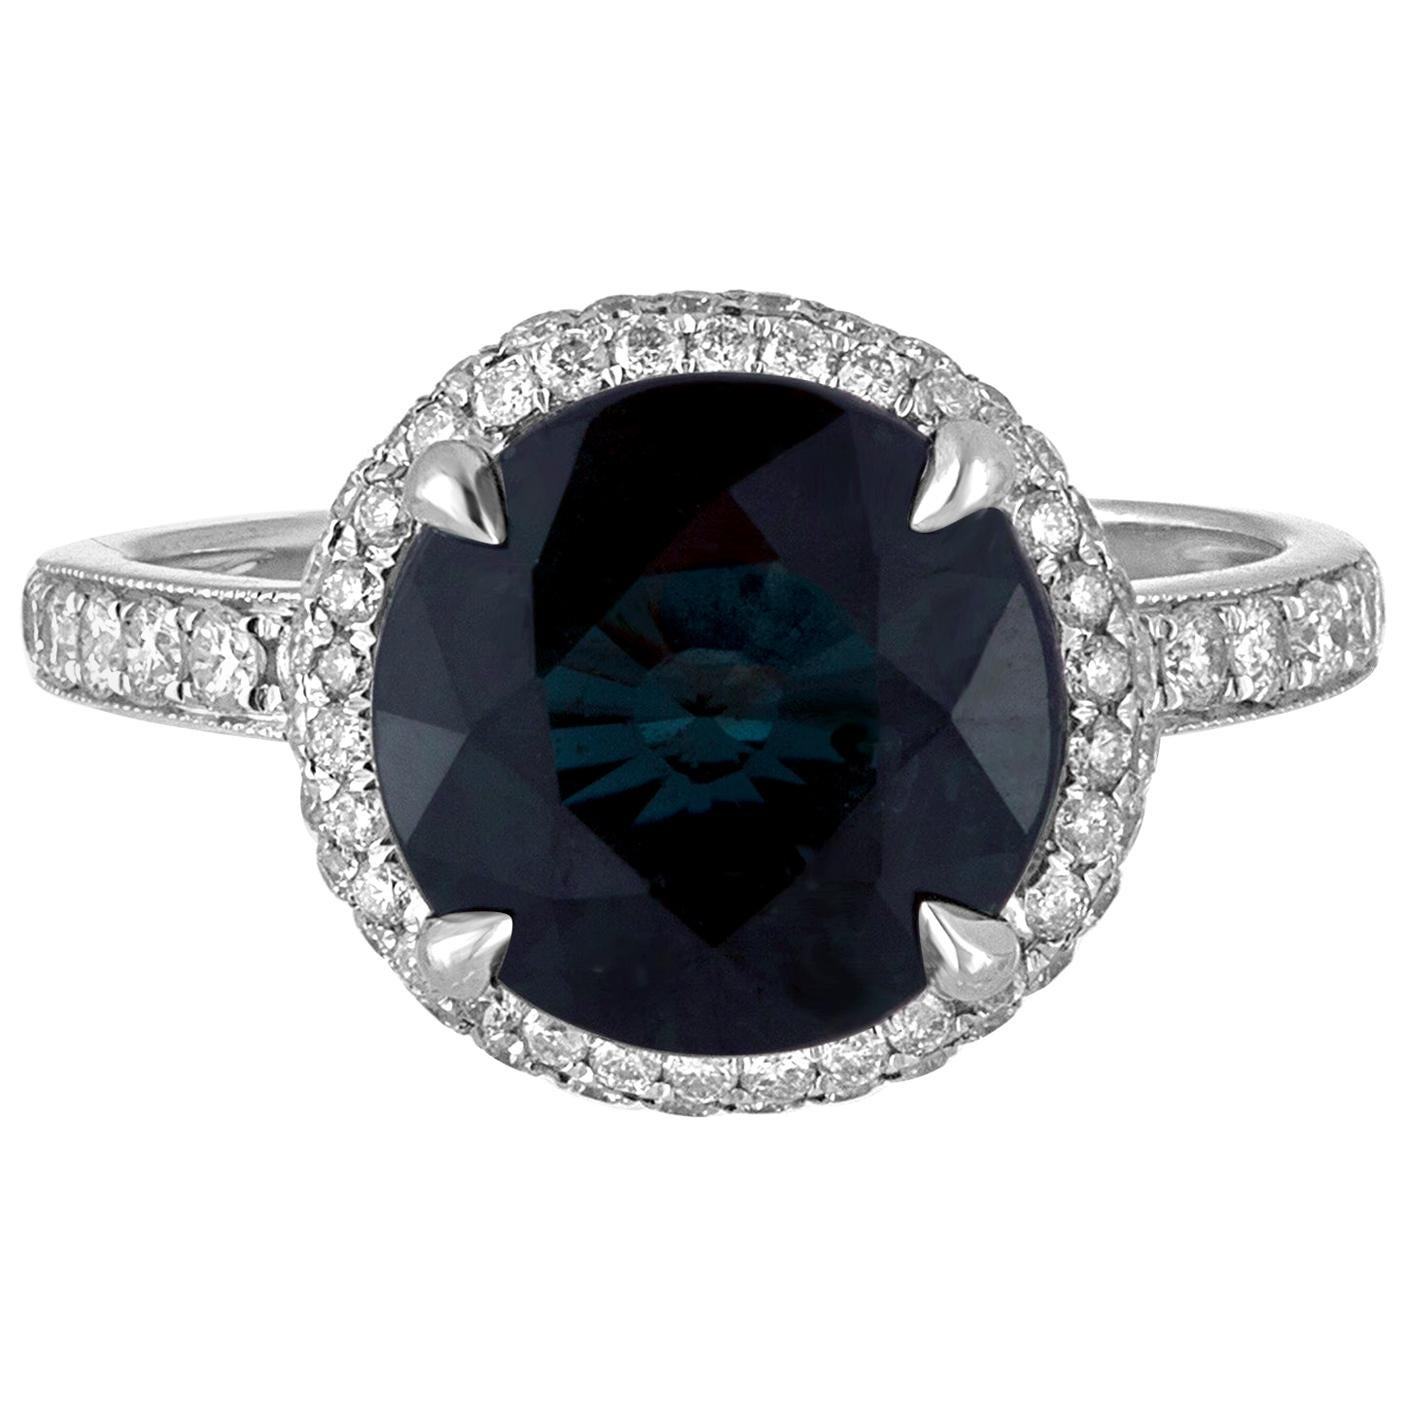 Certified No Heat 4.98 Carat Round Greenish Blue Sapphire Diamond Gold Ring